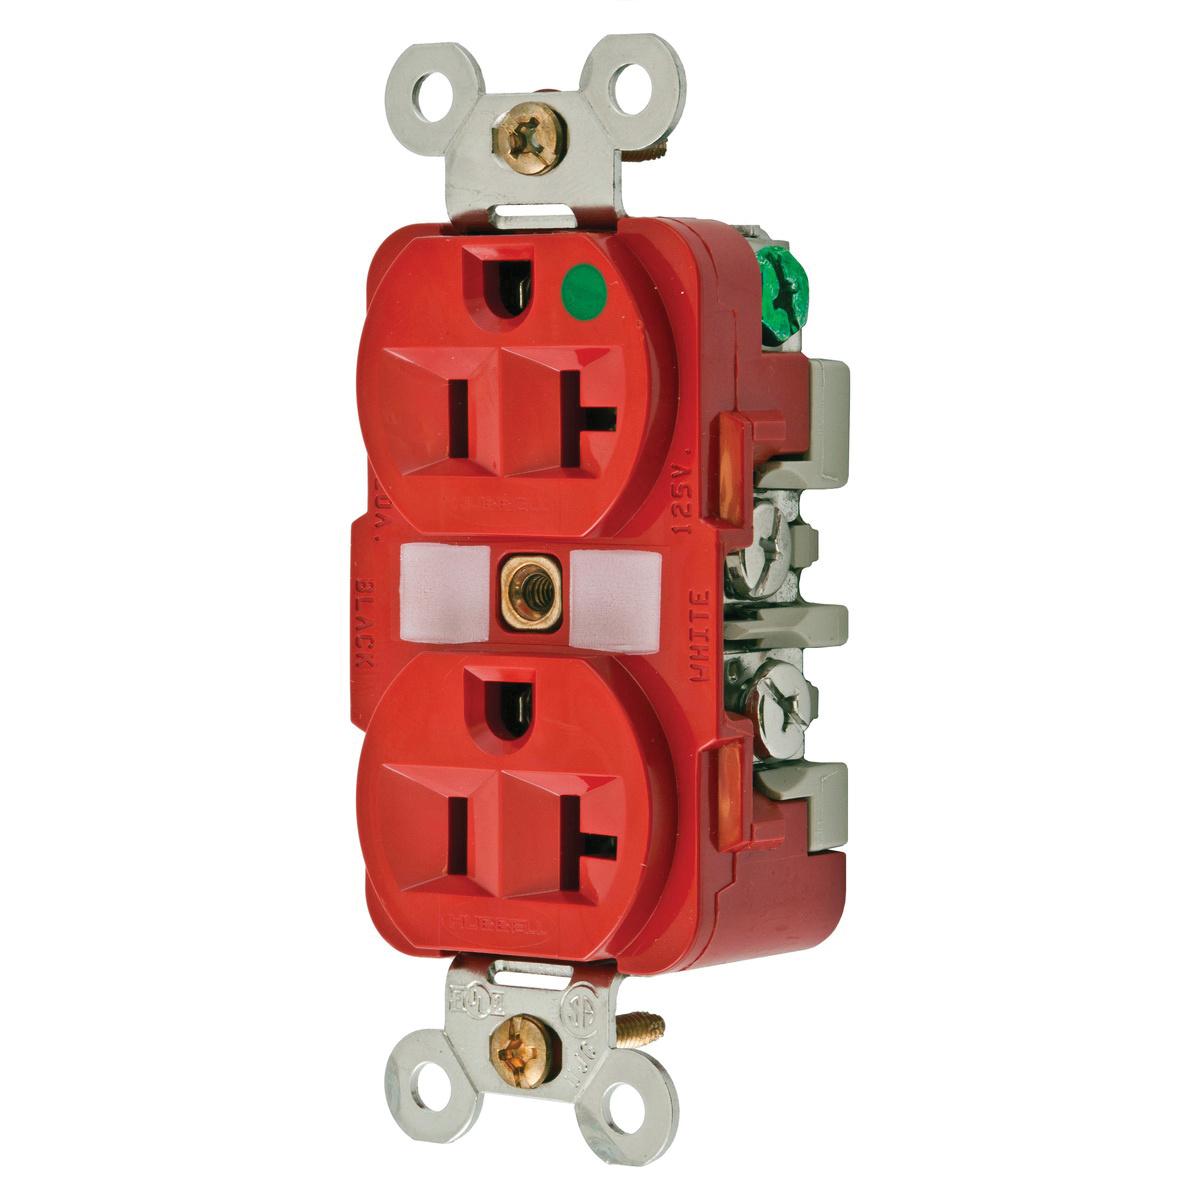 hight resolution of hubbell wiring hbl8300rmri hospital grade traditional straight blade mri receptacle 2 pole 3